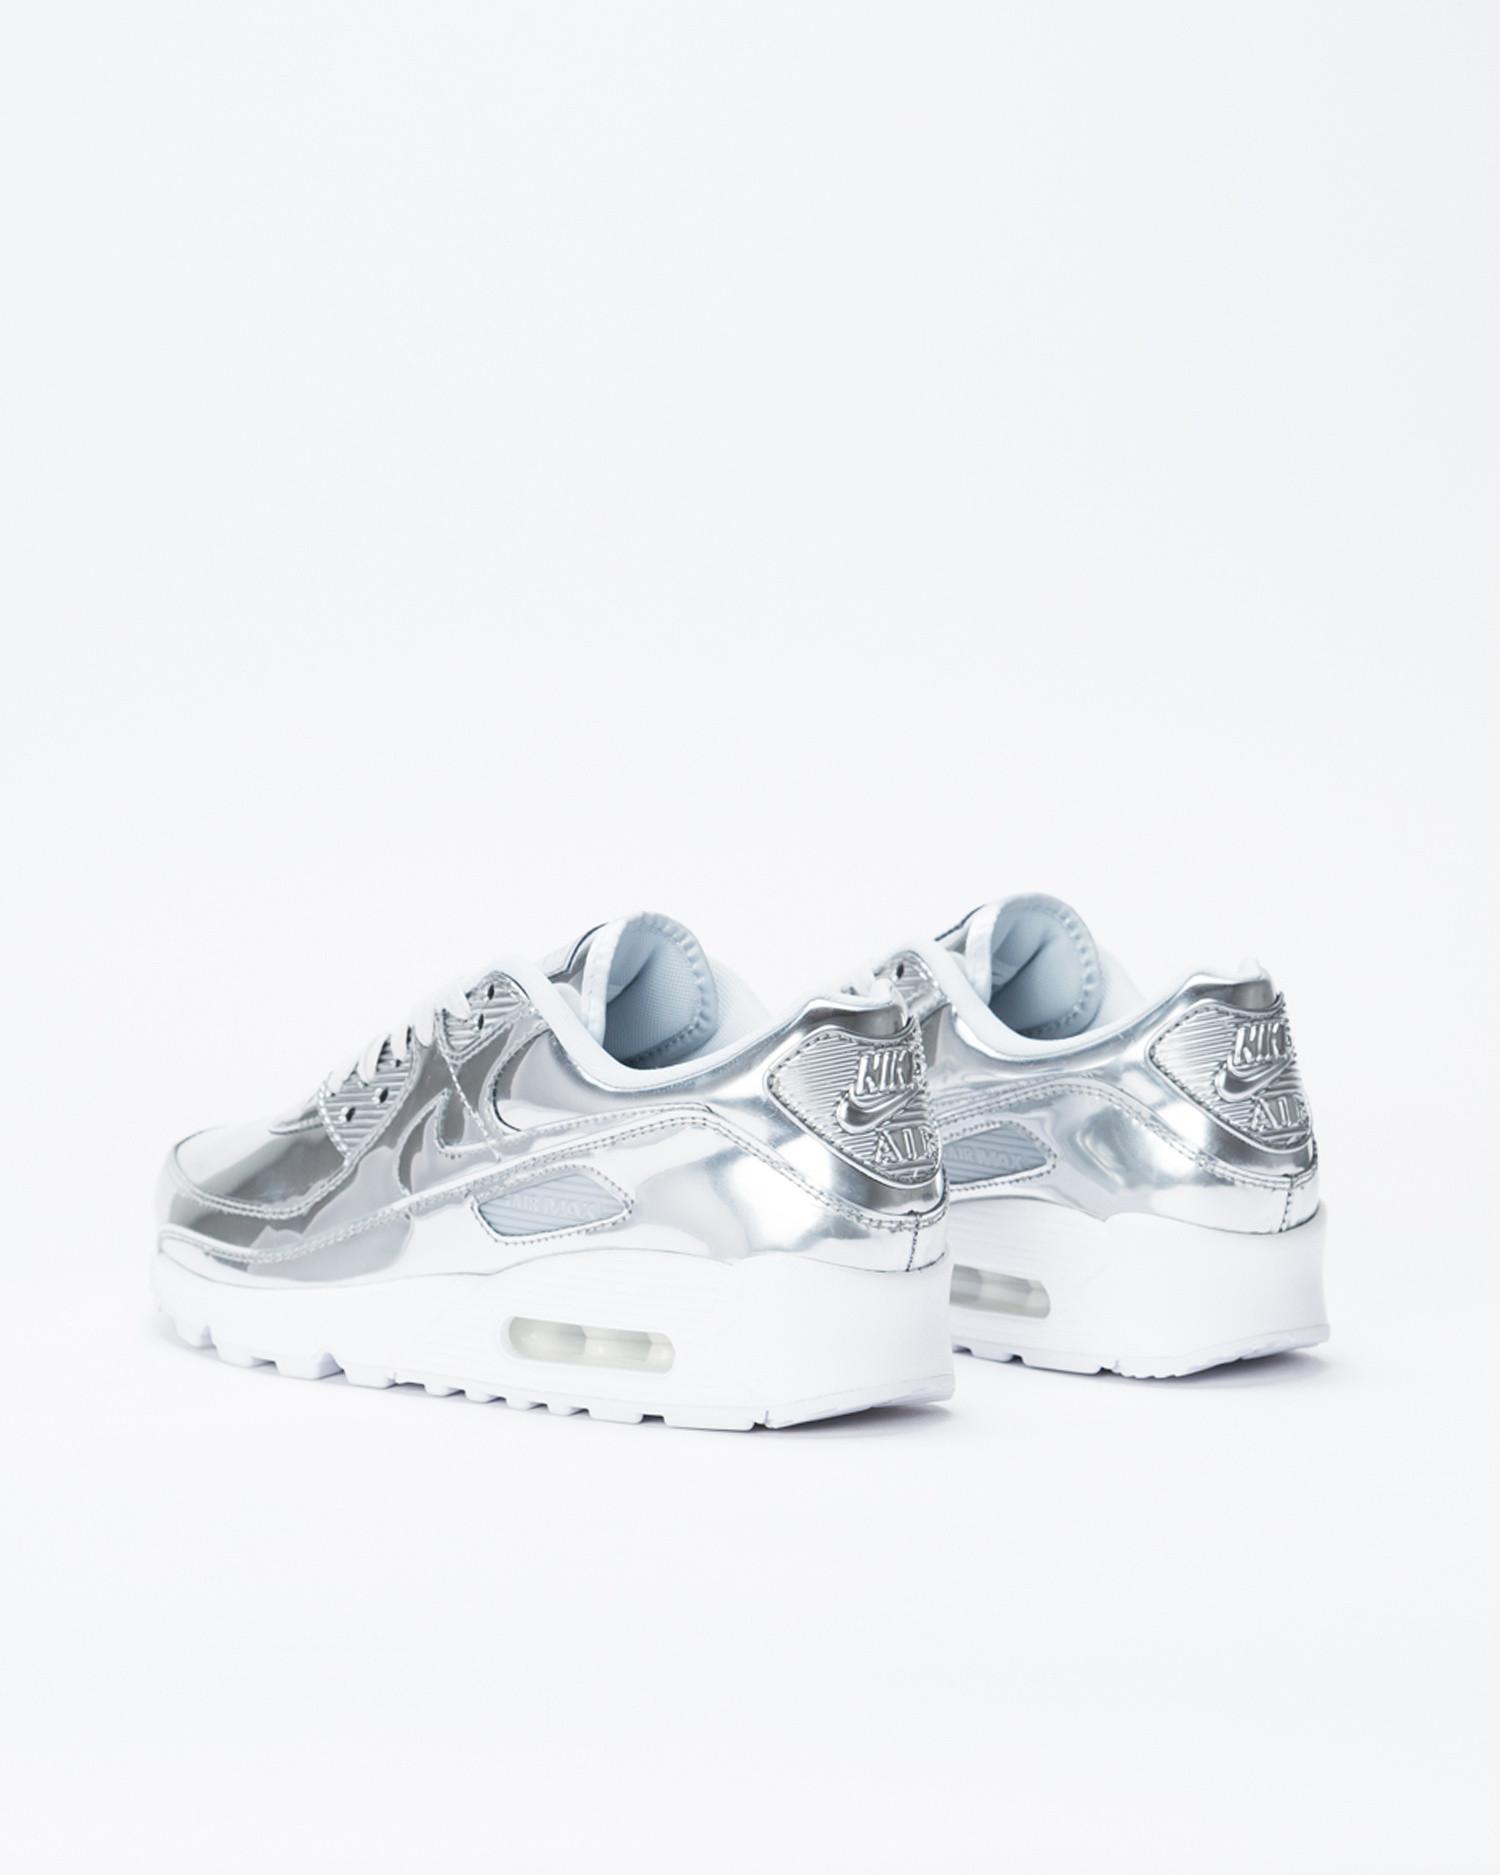 Nike Wmns Air Max 90 sp Chrome/chrome-pure platinum-white